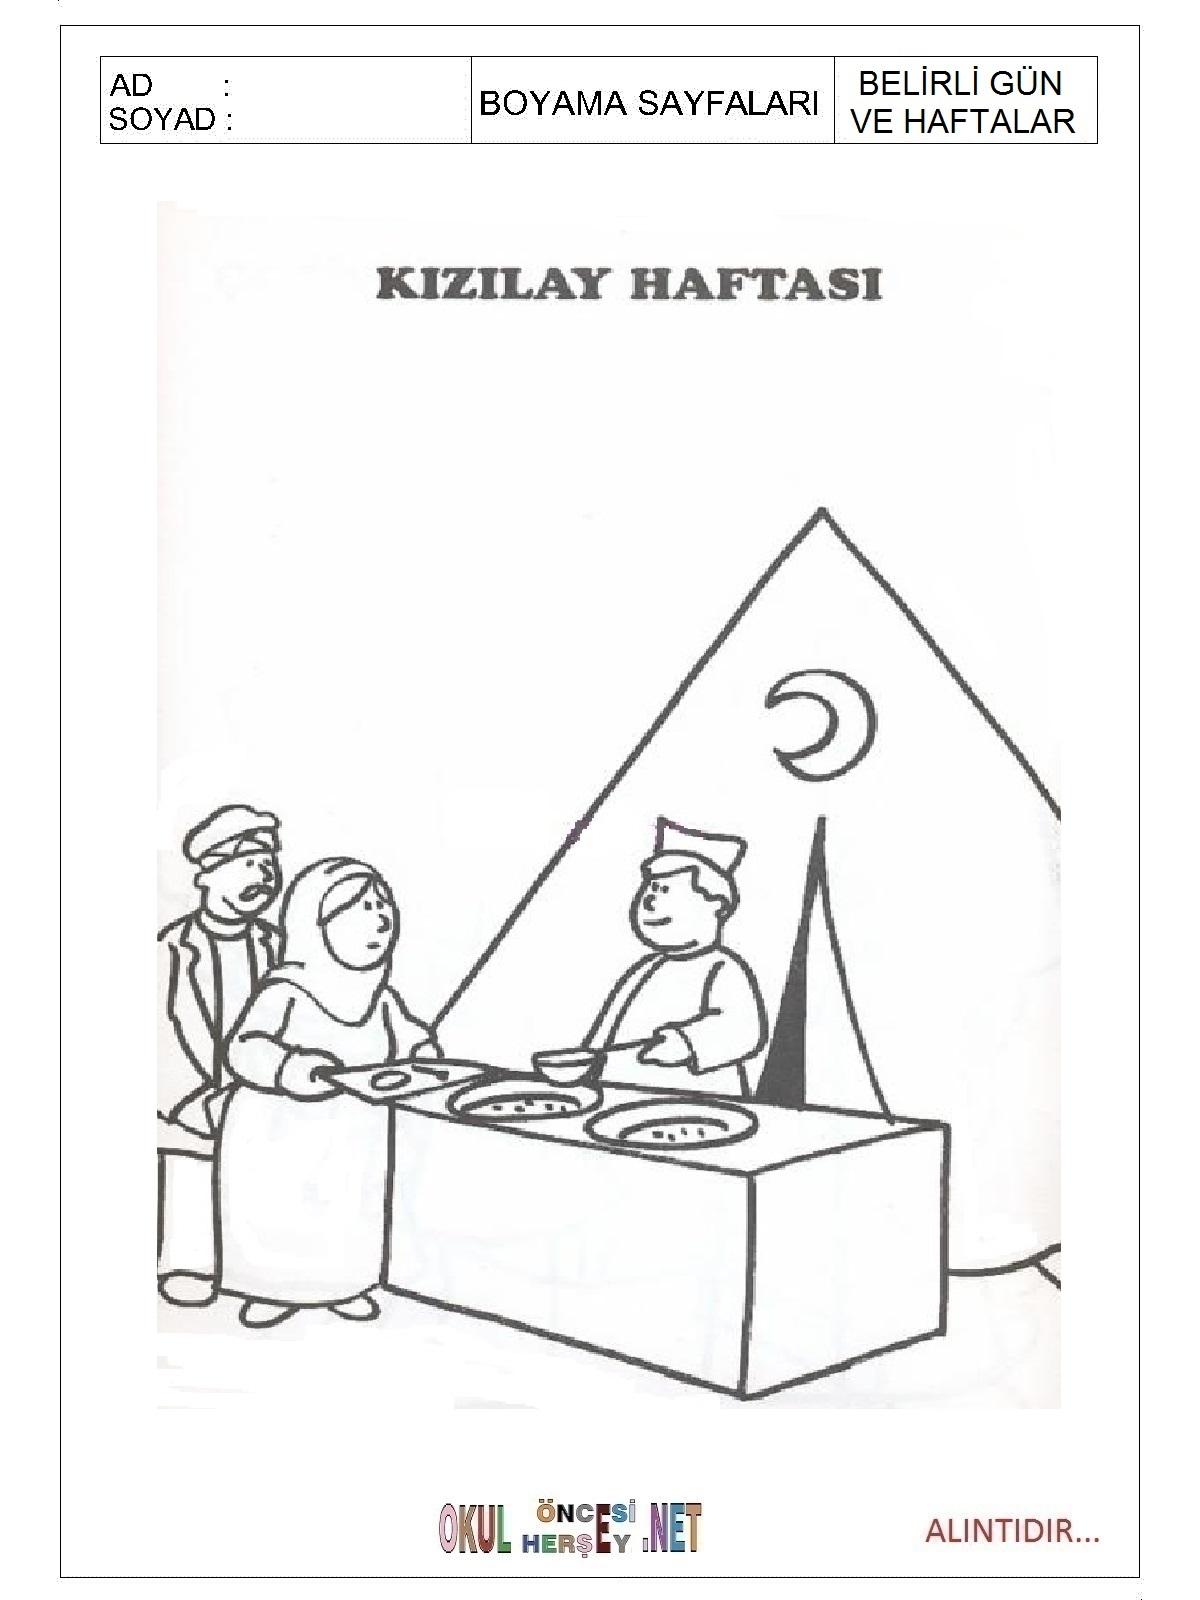 Kizilay Haftasi Boyama Sayfalari